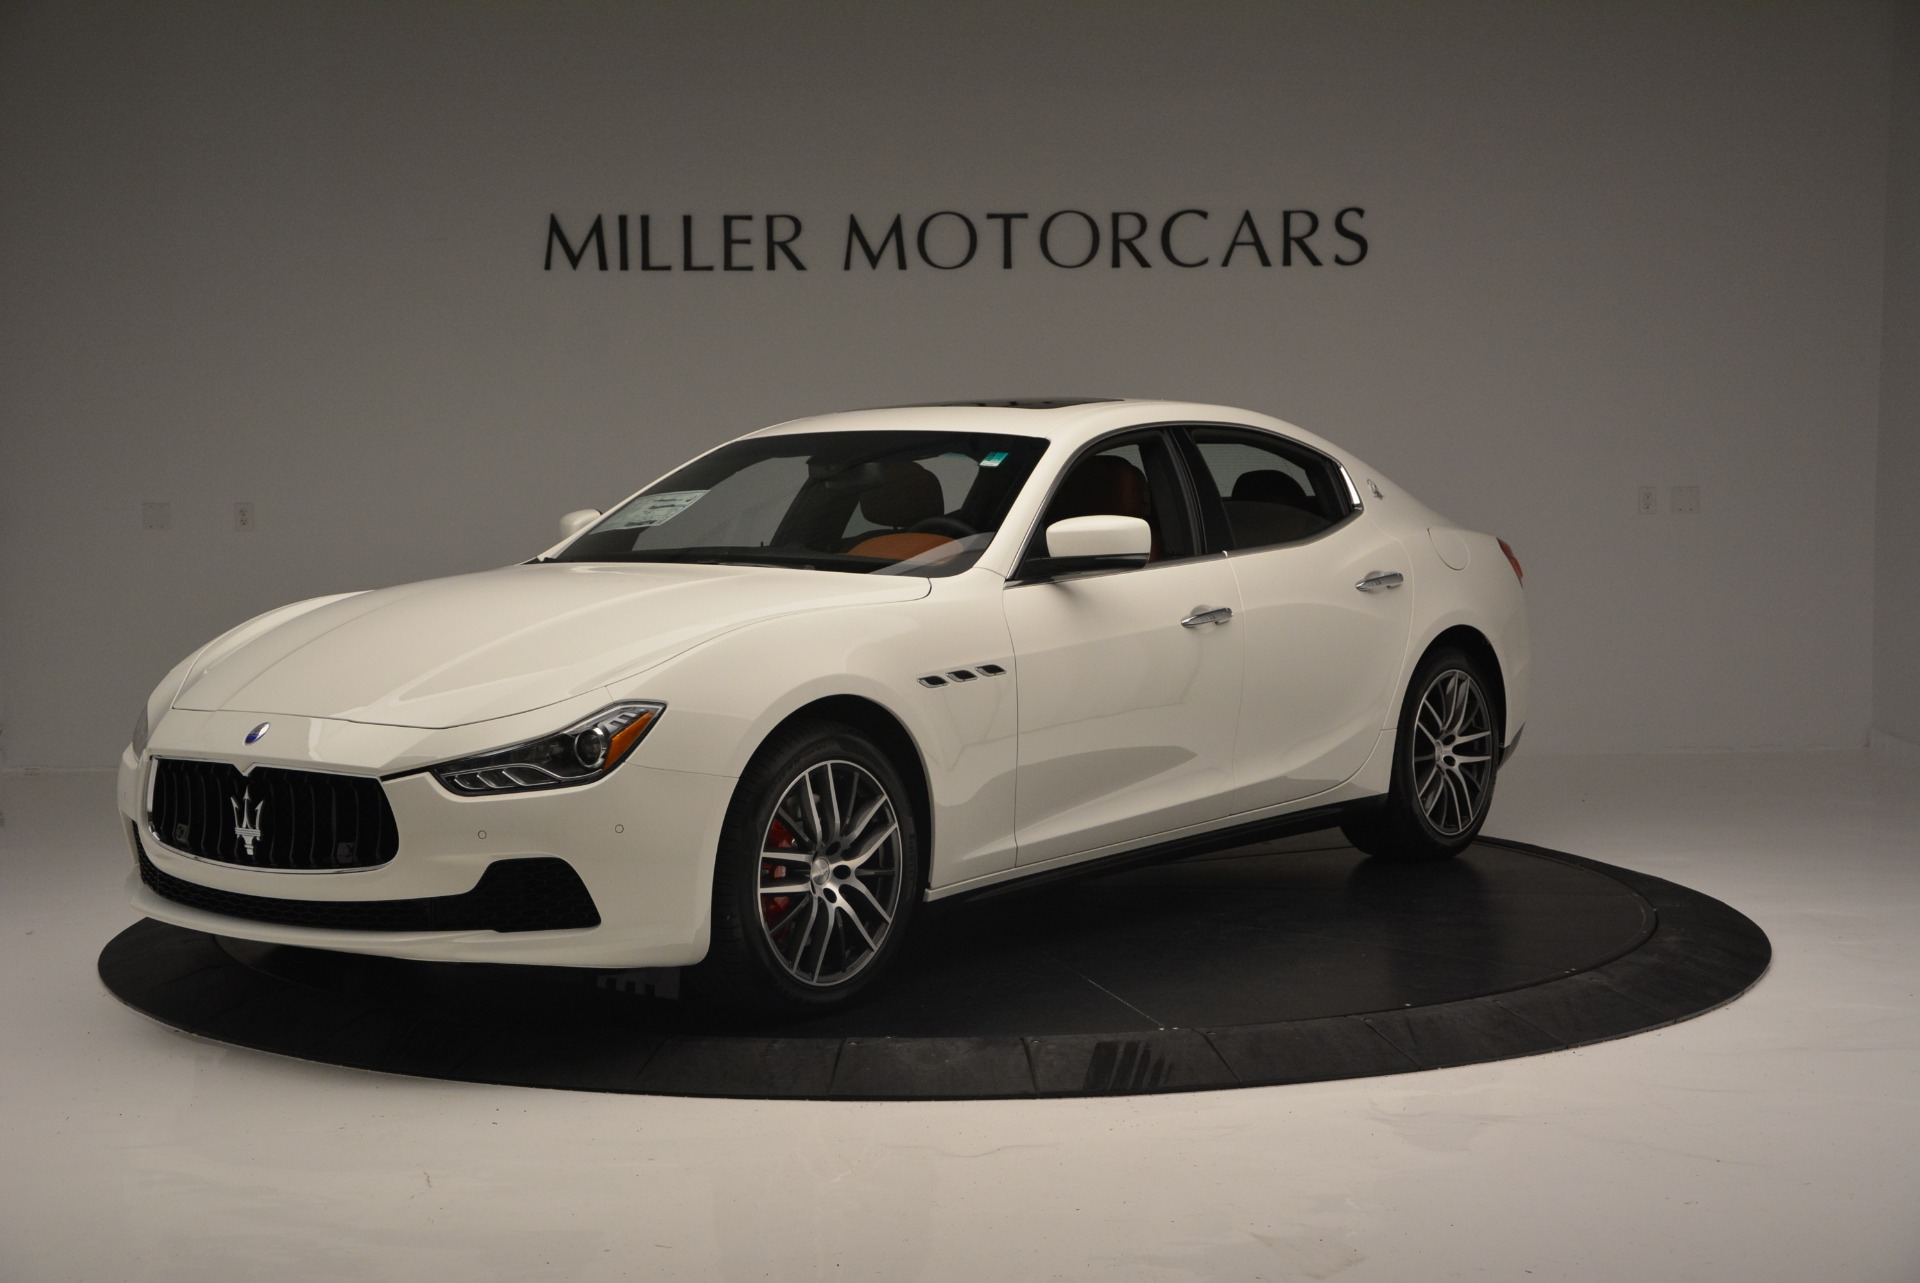 Used 2017 Maserati Ghibli S Q4 Ex-Loaner For Sale In Greenwich, CT 719_main